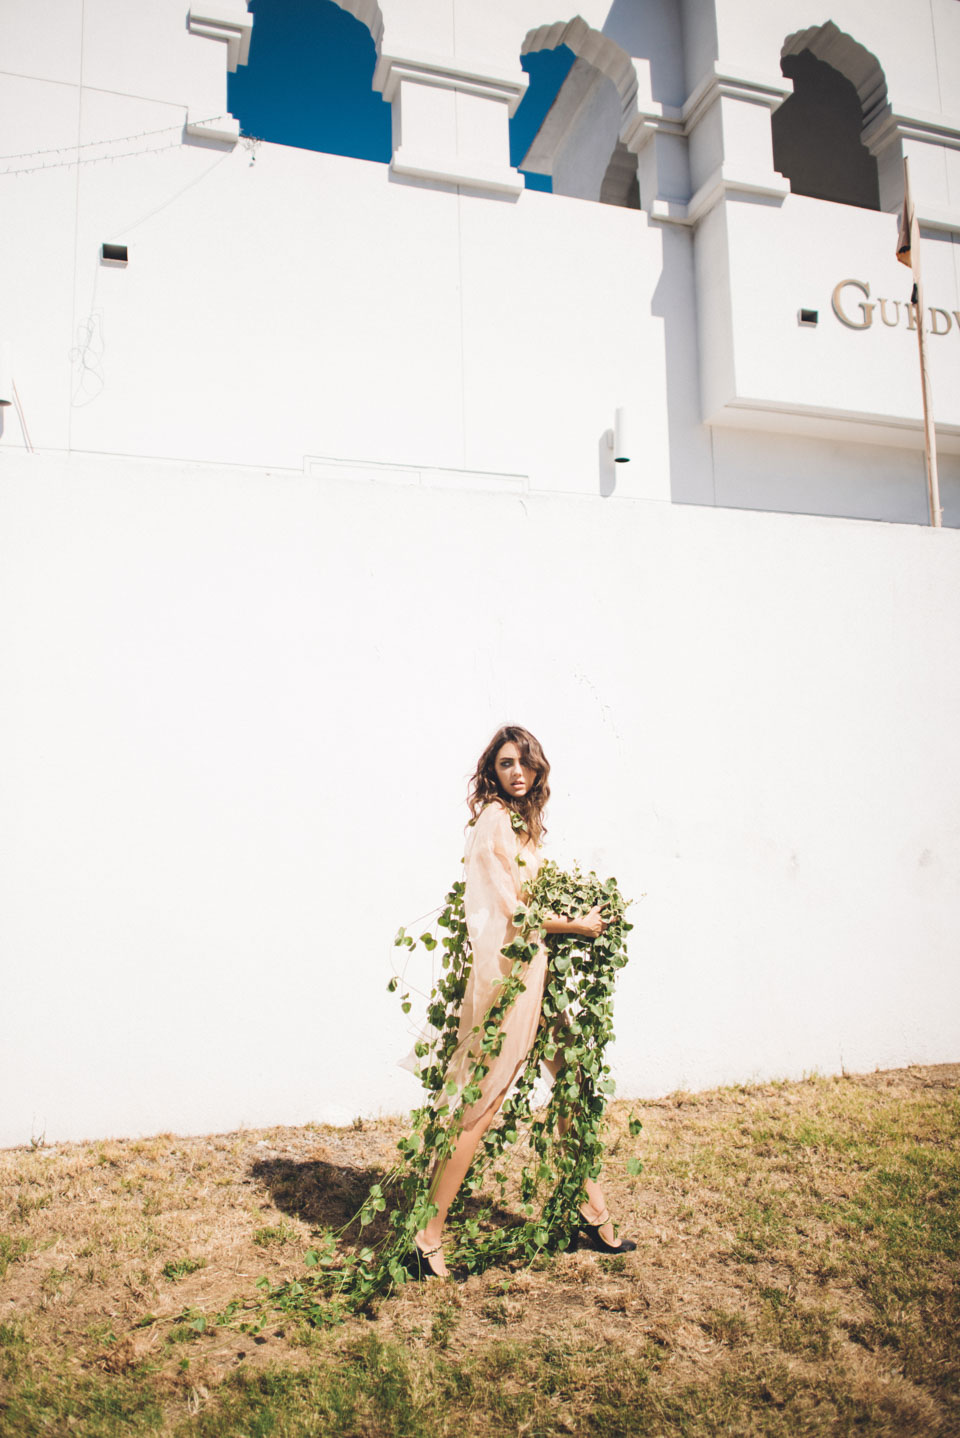 erika astrid fashion photographer and artist46.jpg